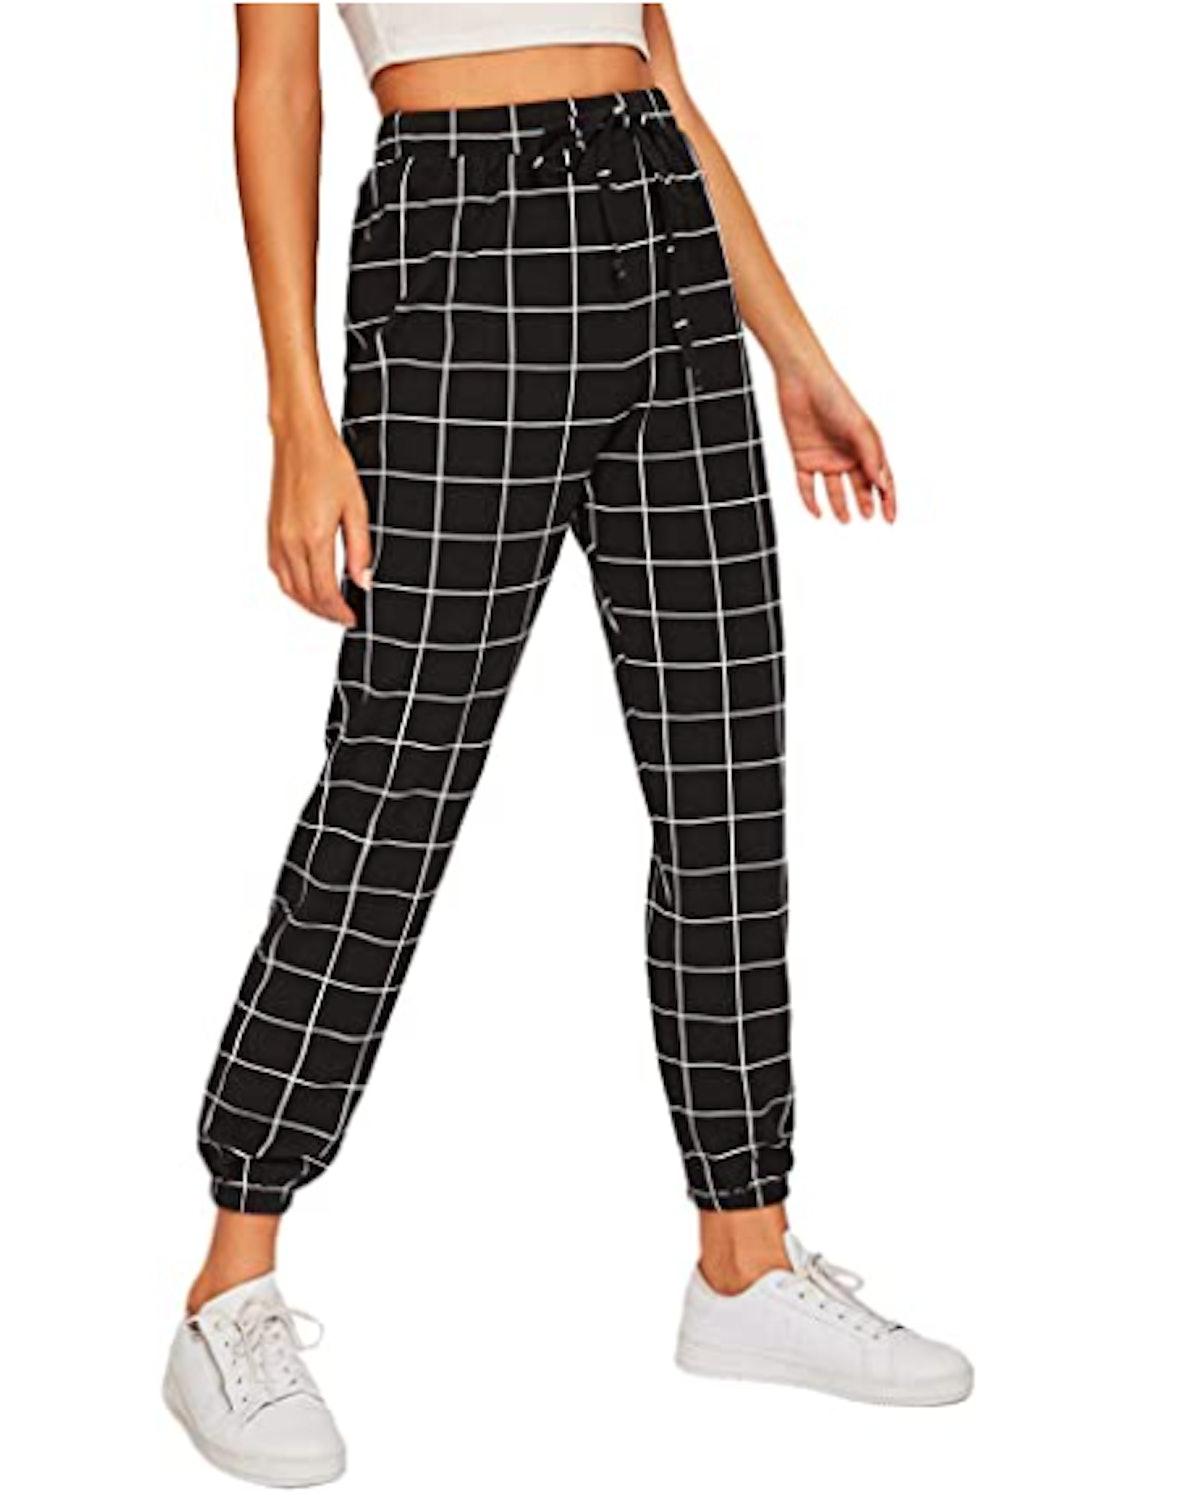 SweatyRocks High Waist Pants